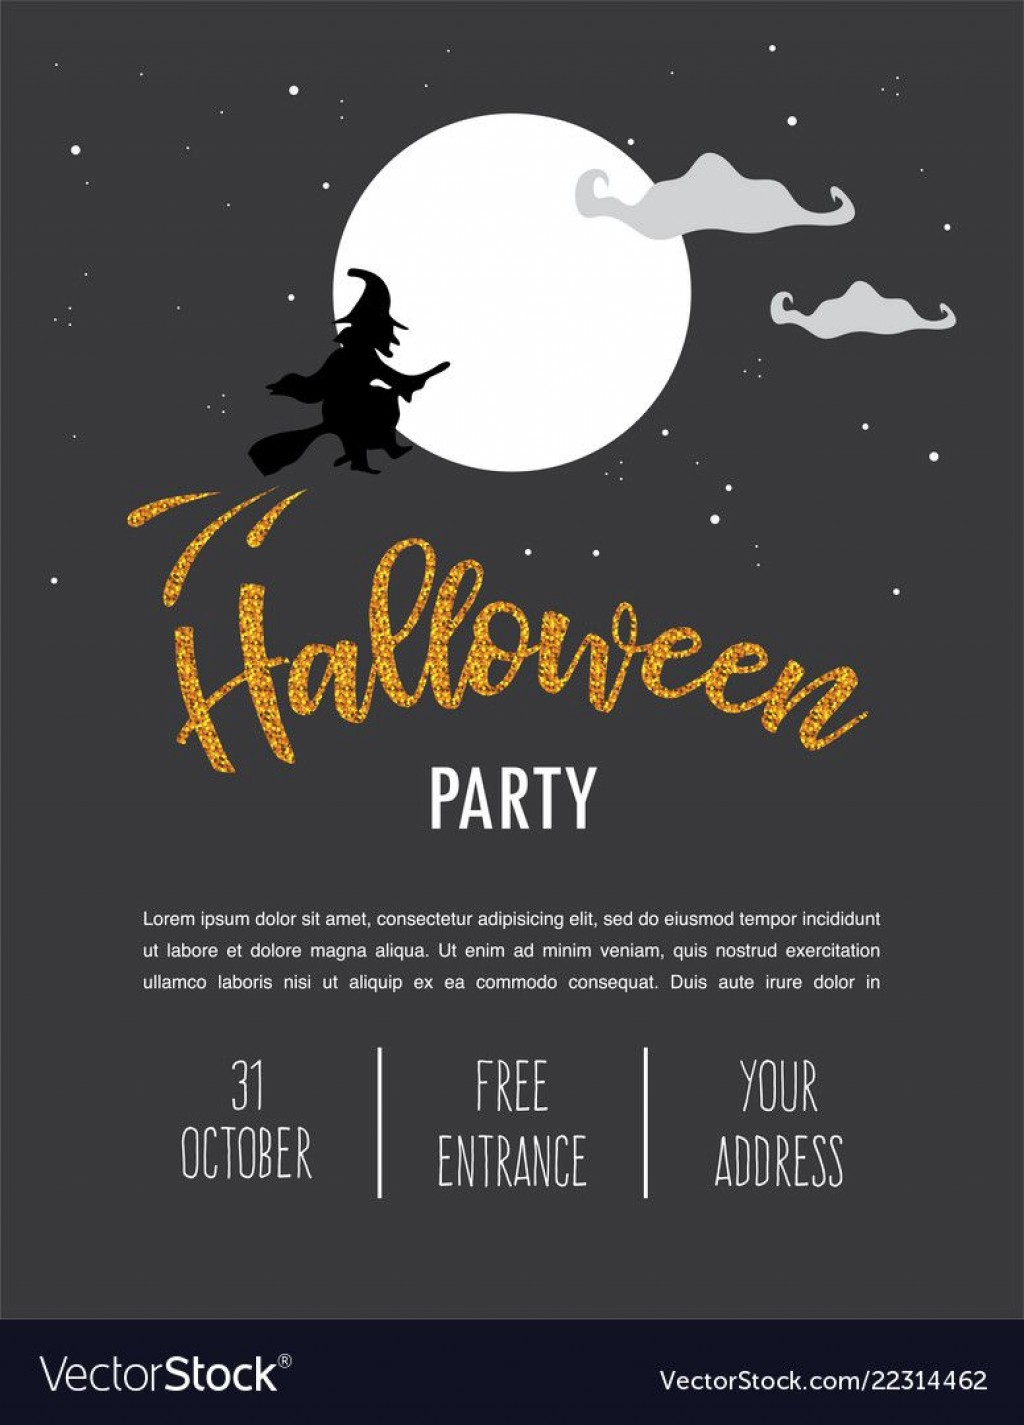 009 Unforgettable Halloween Party Invitation Template Sample  Microsoft Block OctoberLarge